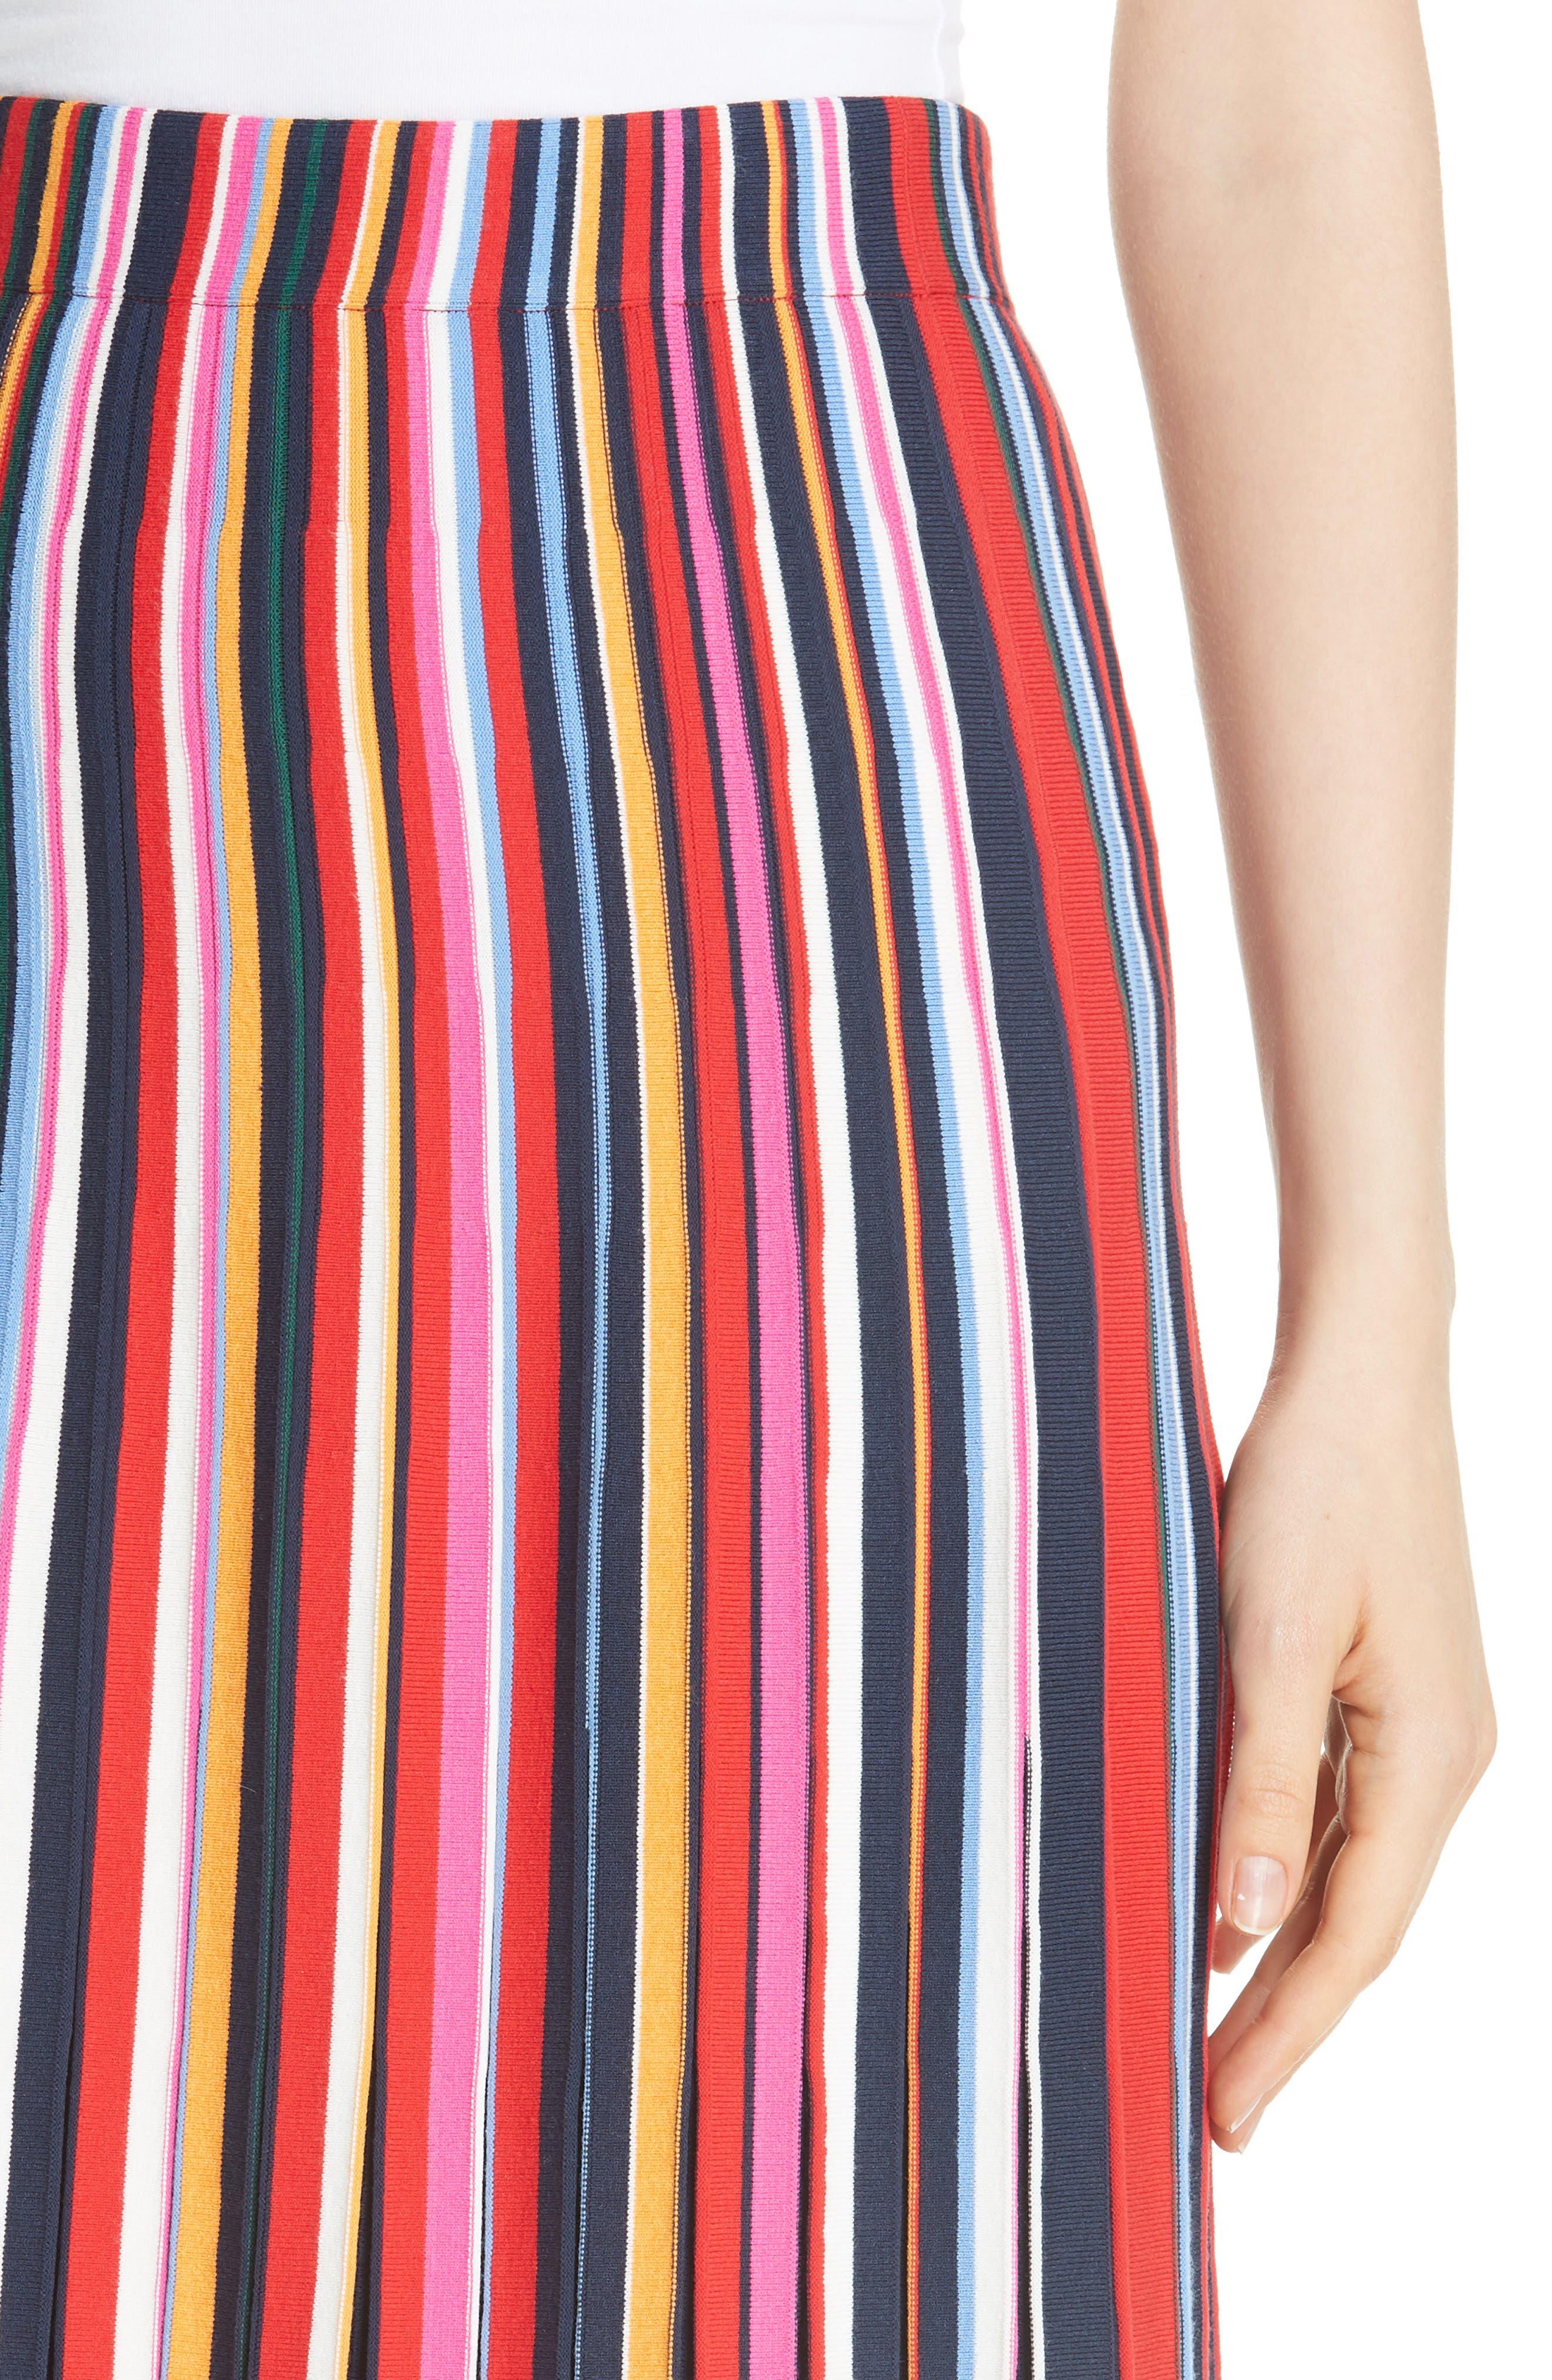 Ellis Stripe Pleated Skirt,                             Alternate thumbnail 4, color,                             405